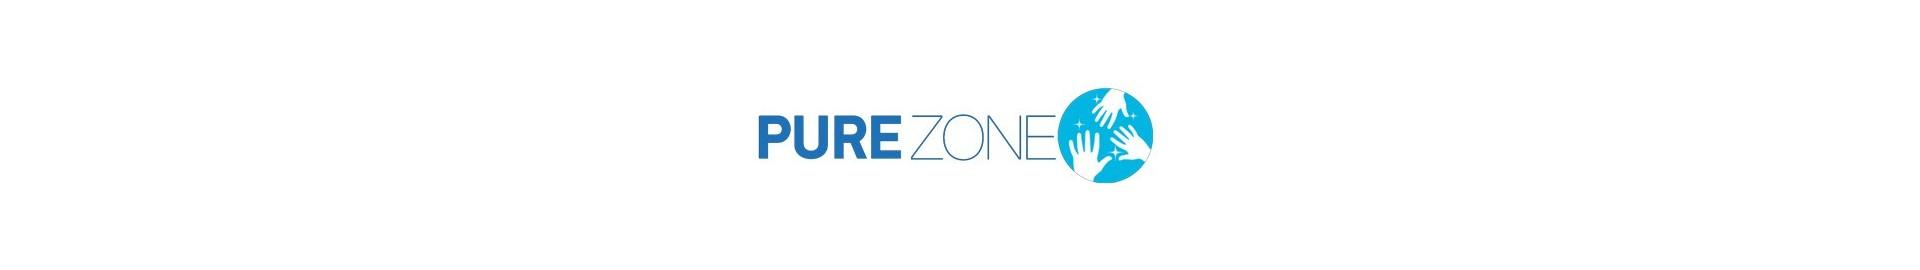 Film antimicrobien Pure Zone